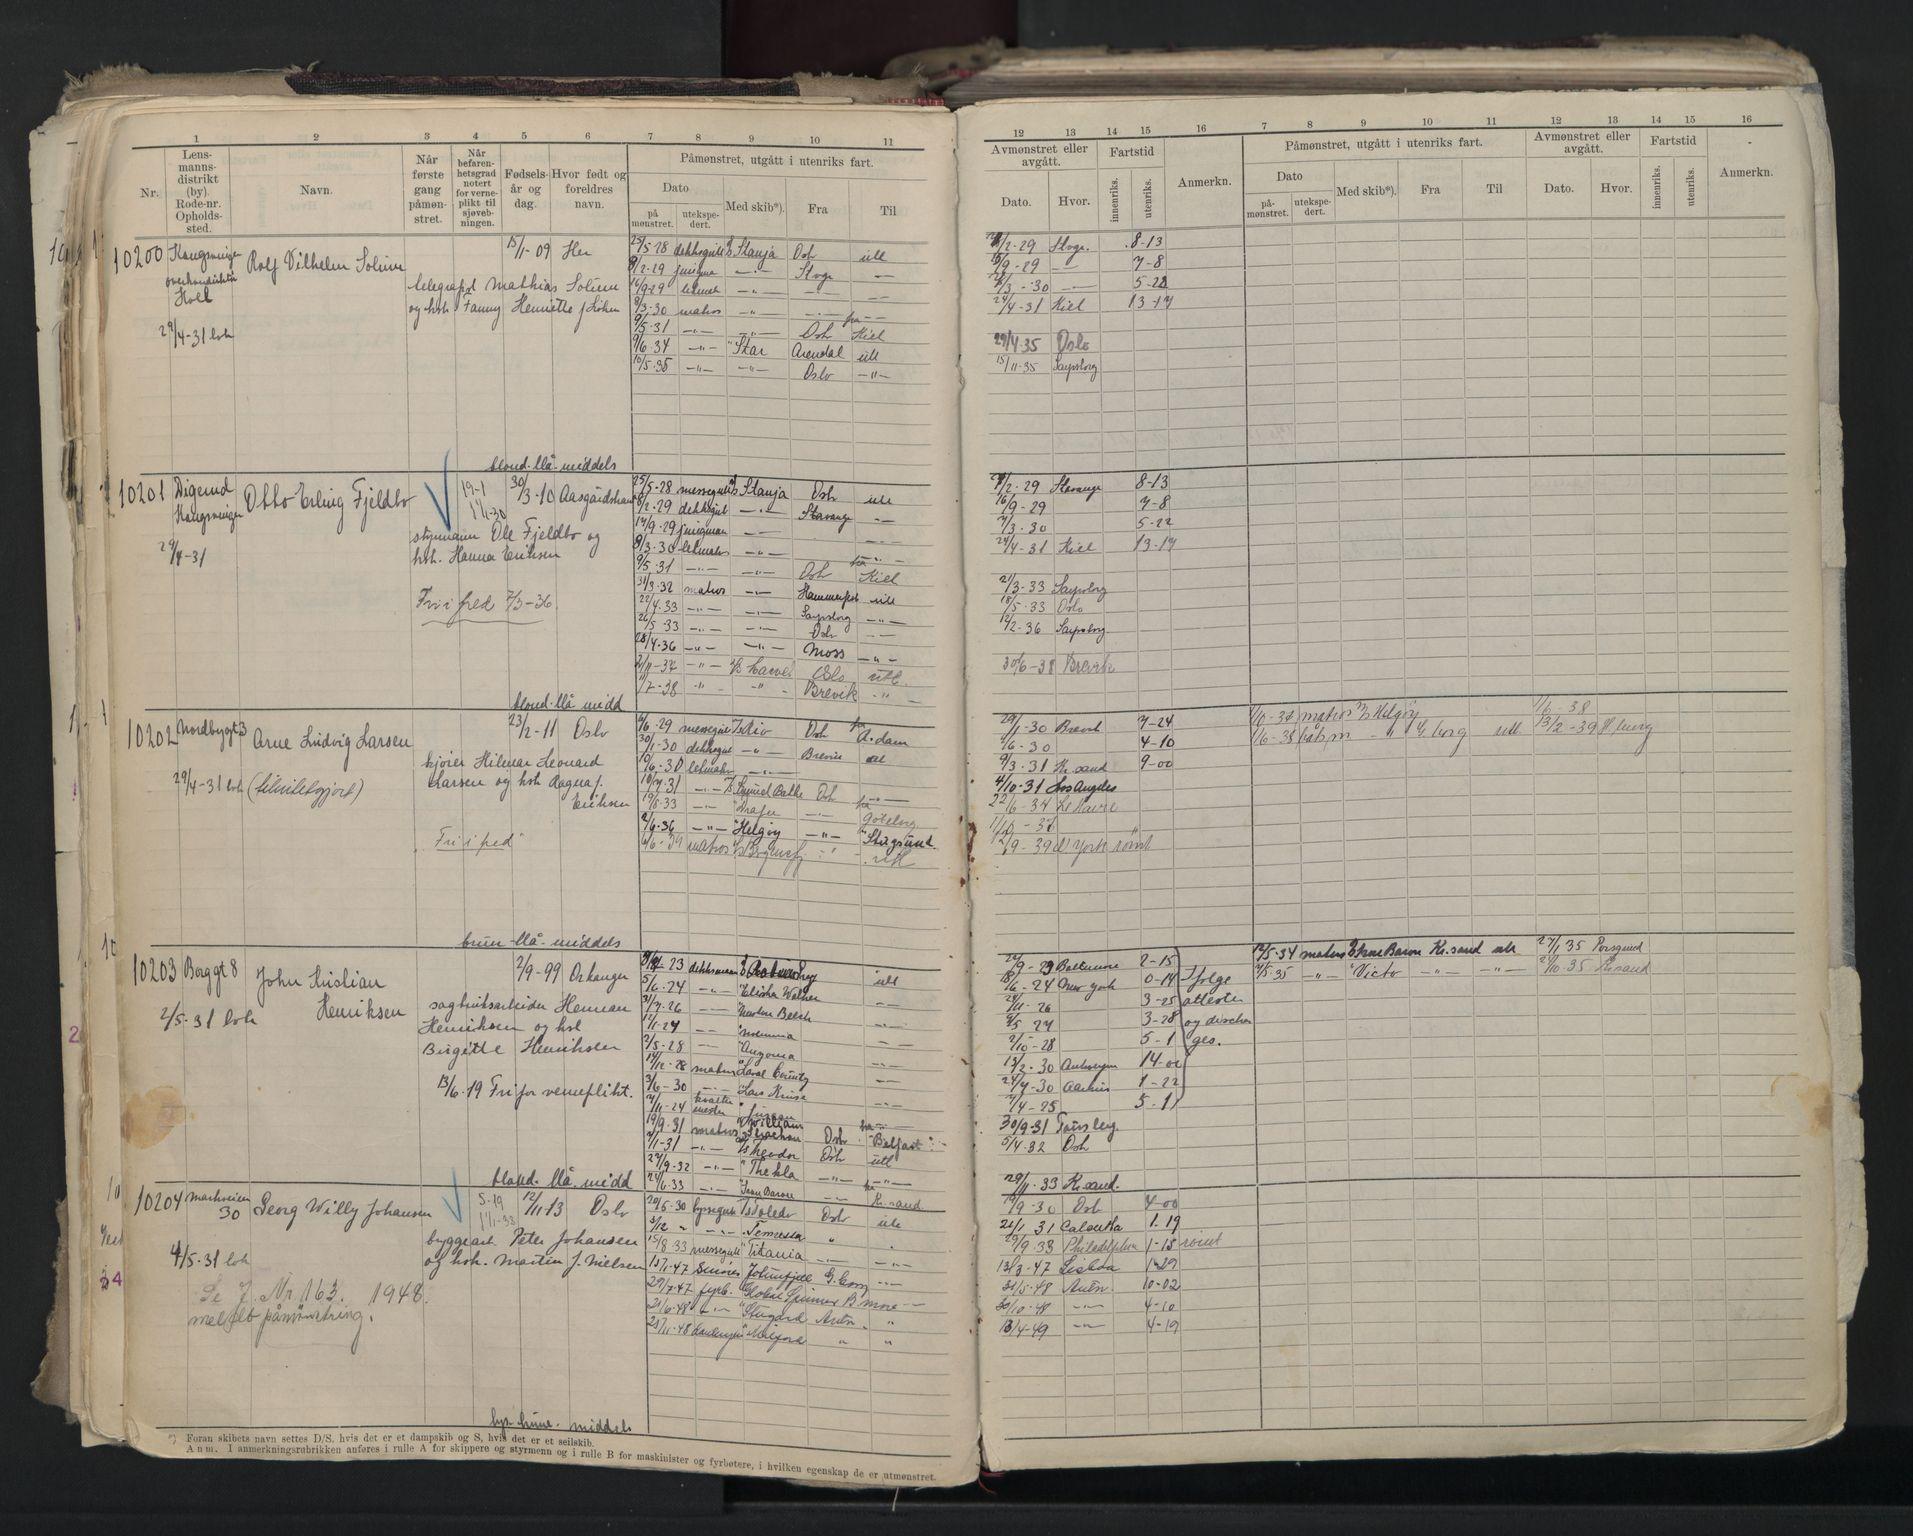 SAO, Oslo sjømannskontor, F/Fc/L0007: Hovedrulle, 1930-1948, s. 37